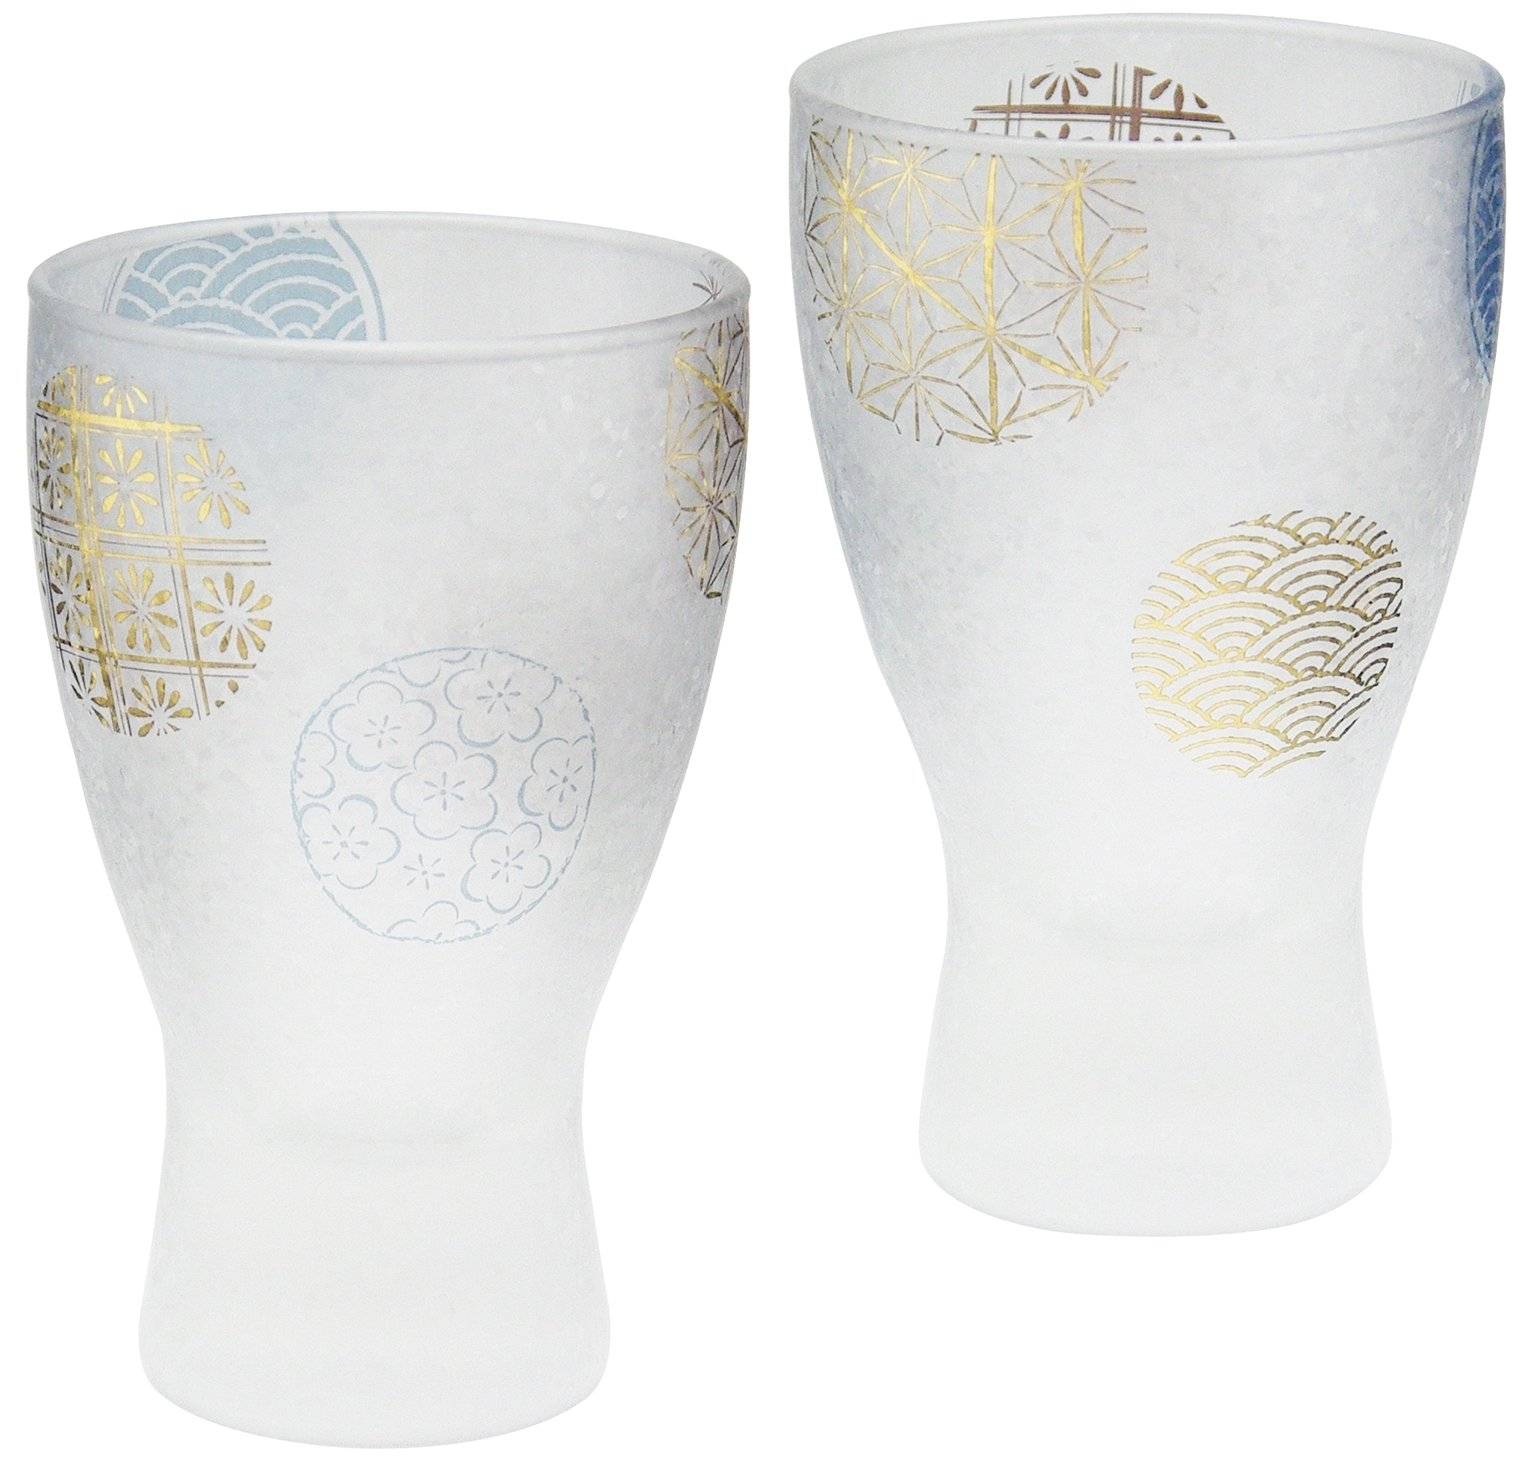 Adelia Sake Glass 100ml Pair Set Premium Round Printing Series S-6210